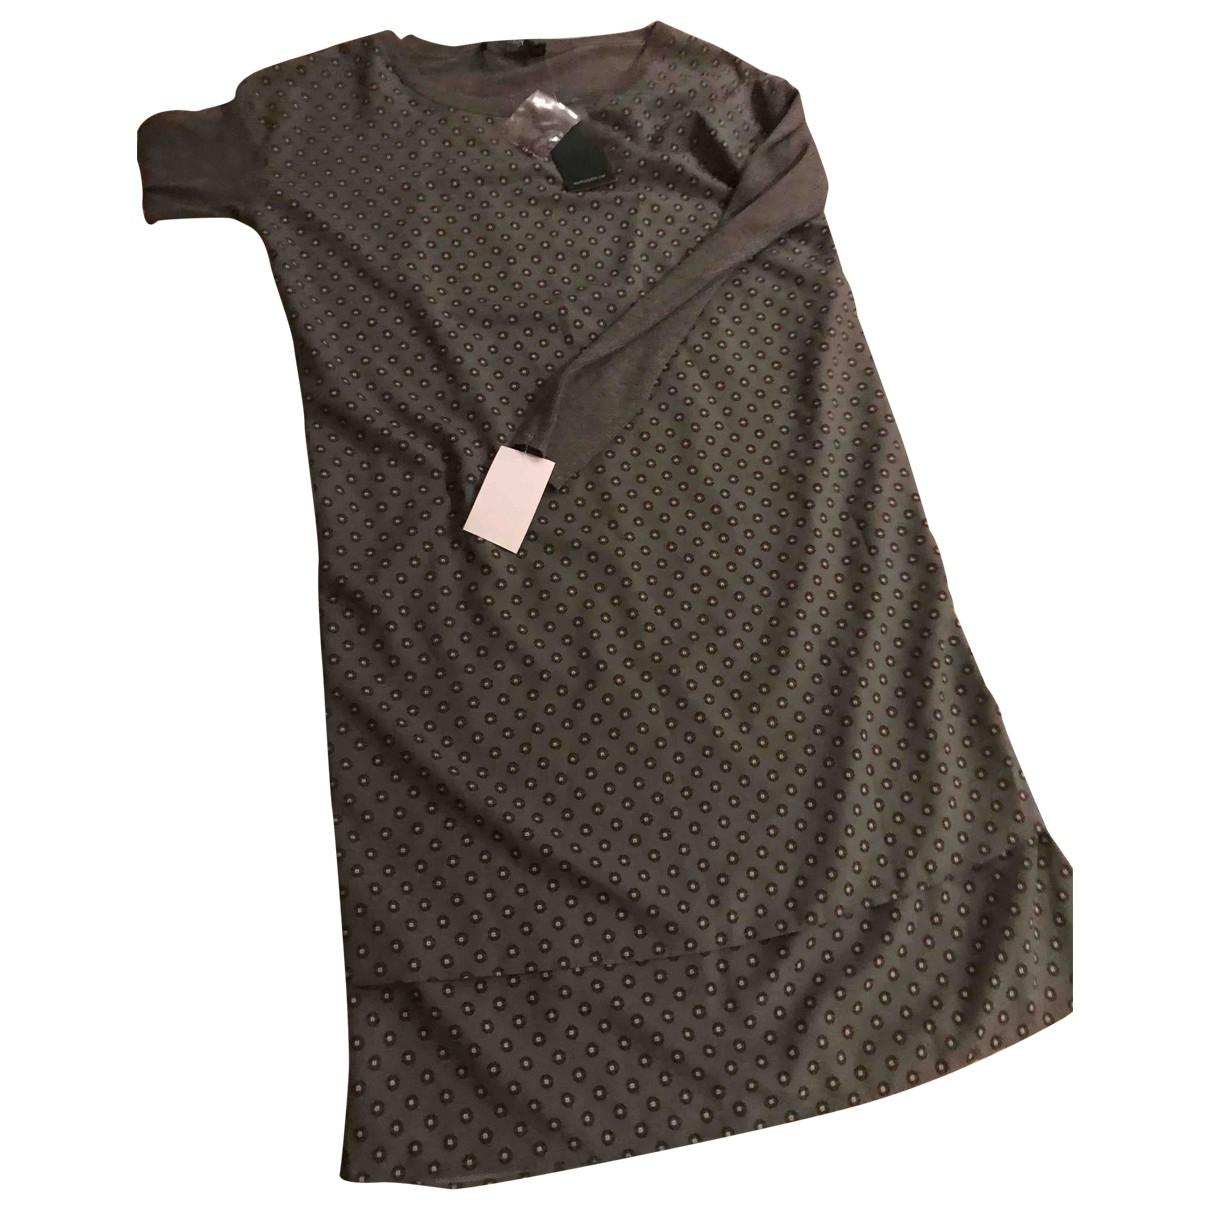 Lauren Ralph Lauren \N Grey Cotton dress for Women XS International